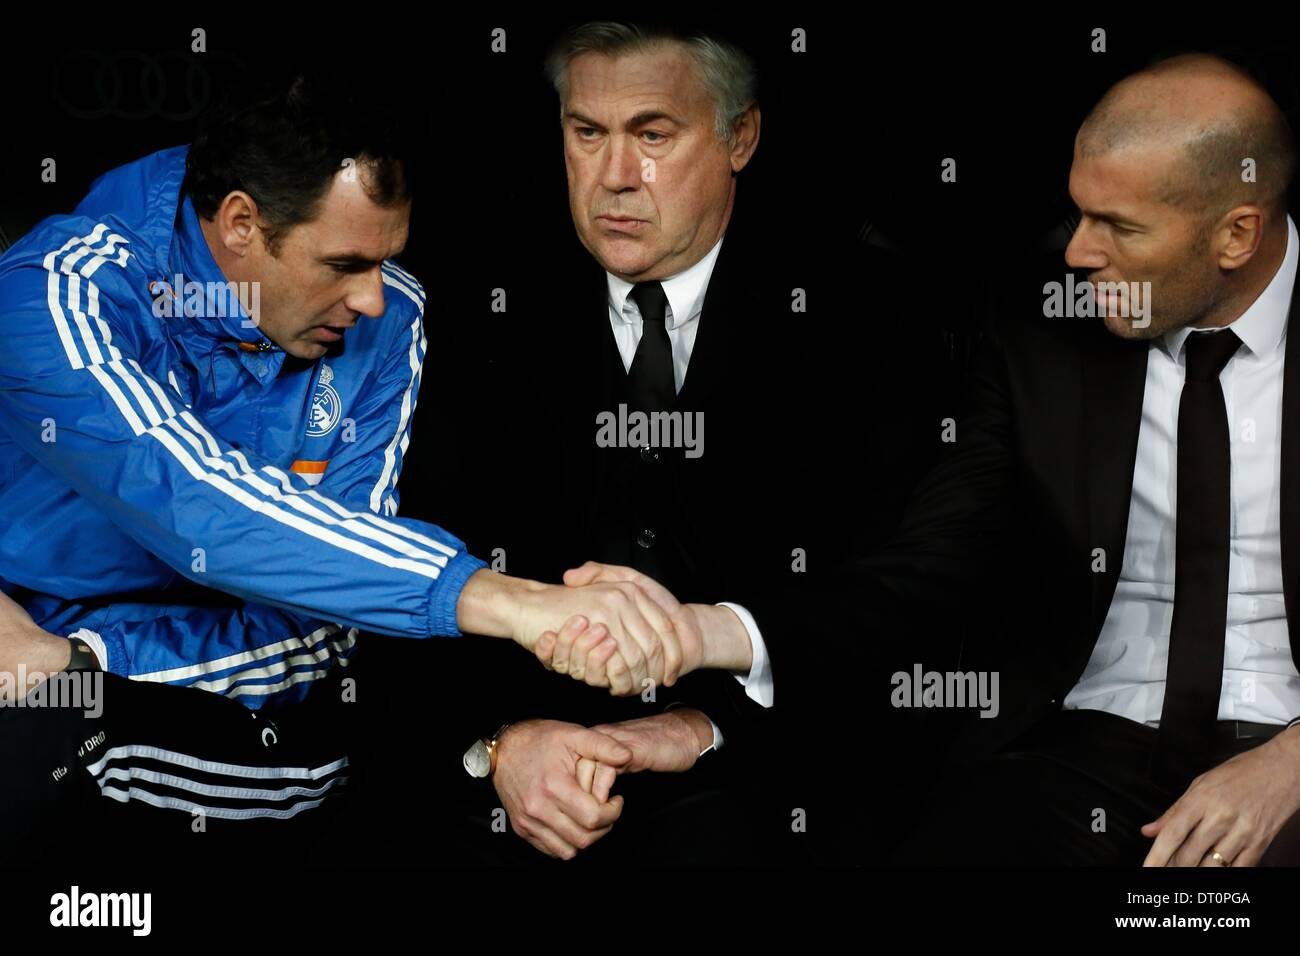 Madrid, Spain. 5th Feb, 2014. Carlo Ancelotti (C) and ZinÌÄ©dine Zidane during the Spanish King's Cup Semifinal, Stock Photo